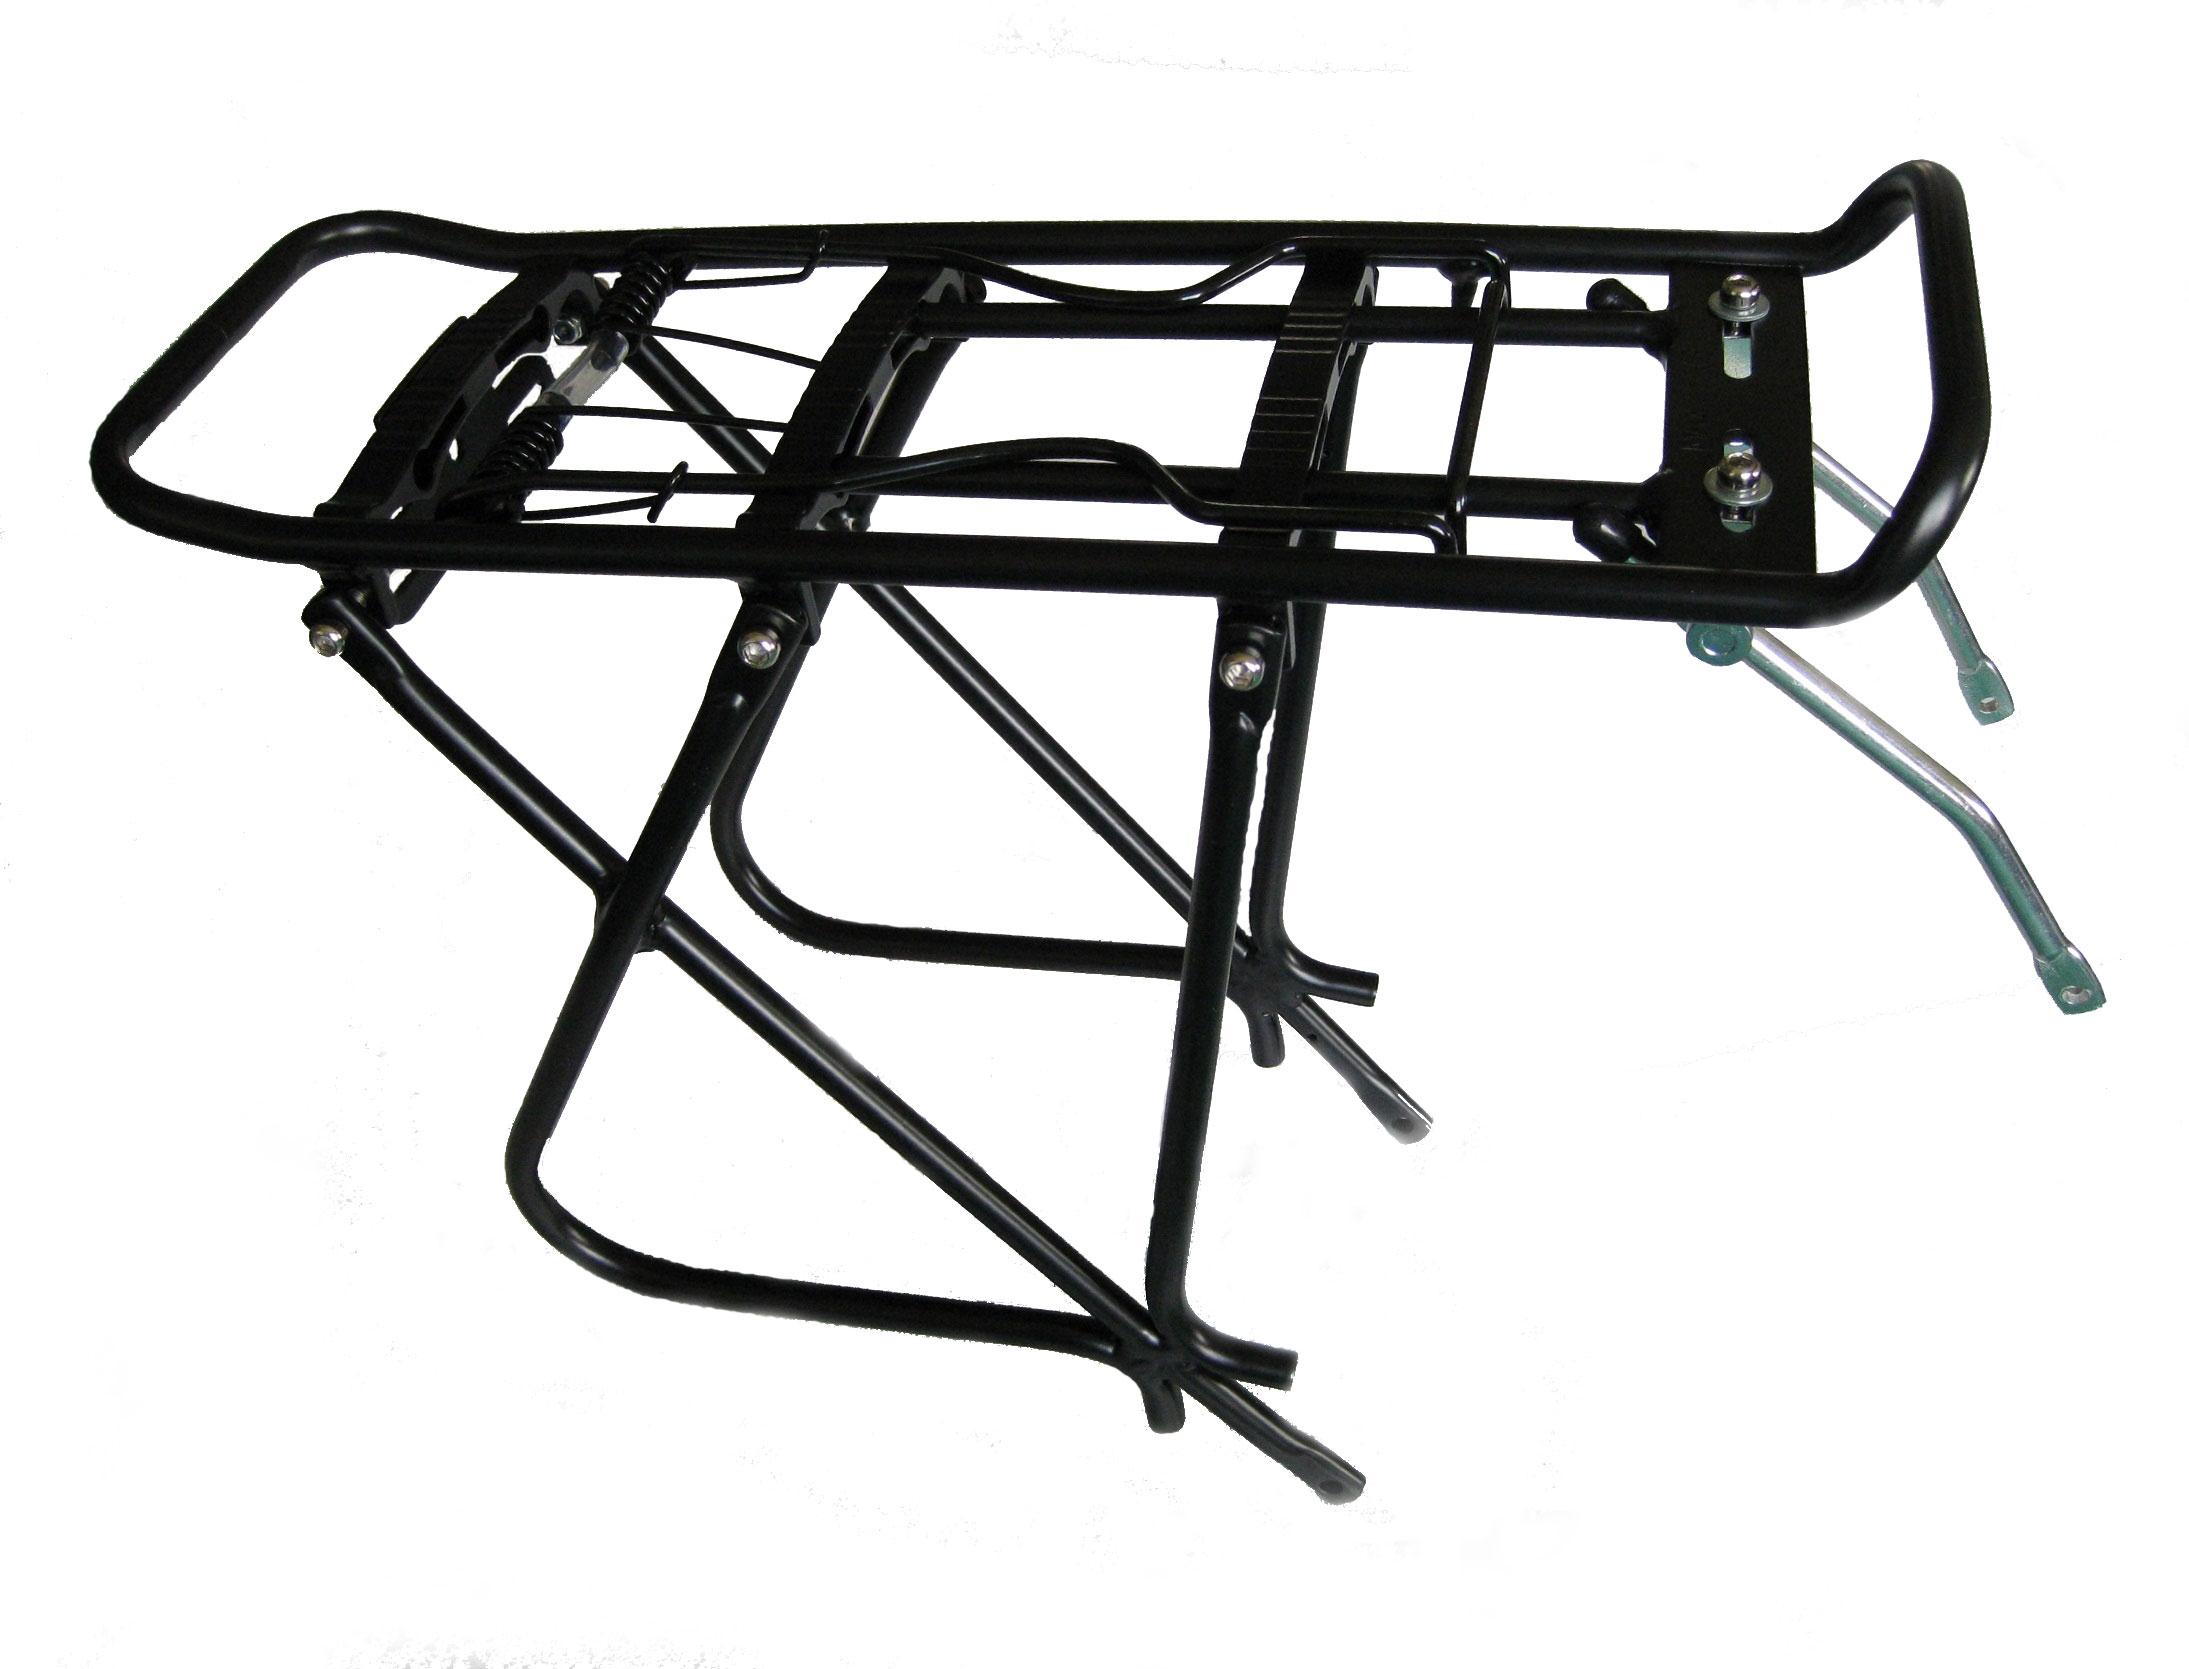 Powerpac Gepäckträger für Elektrofahrrad / E-Bike Mountainbike Bild 1